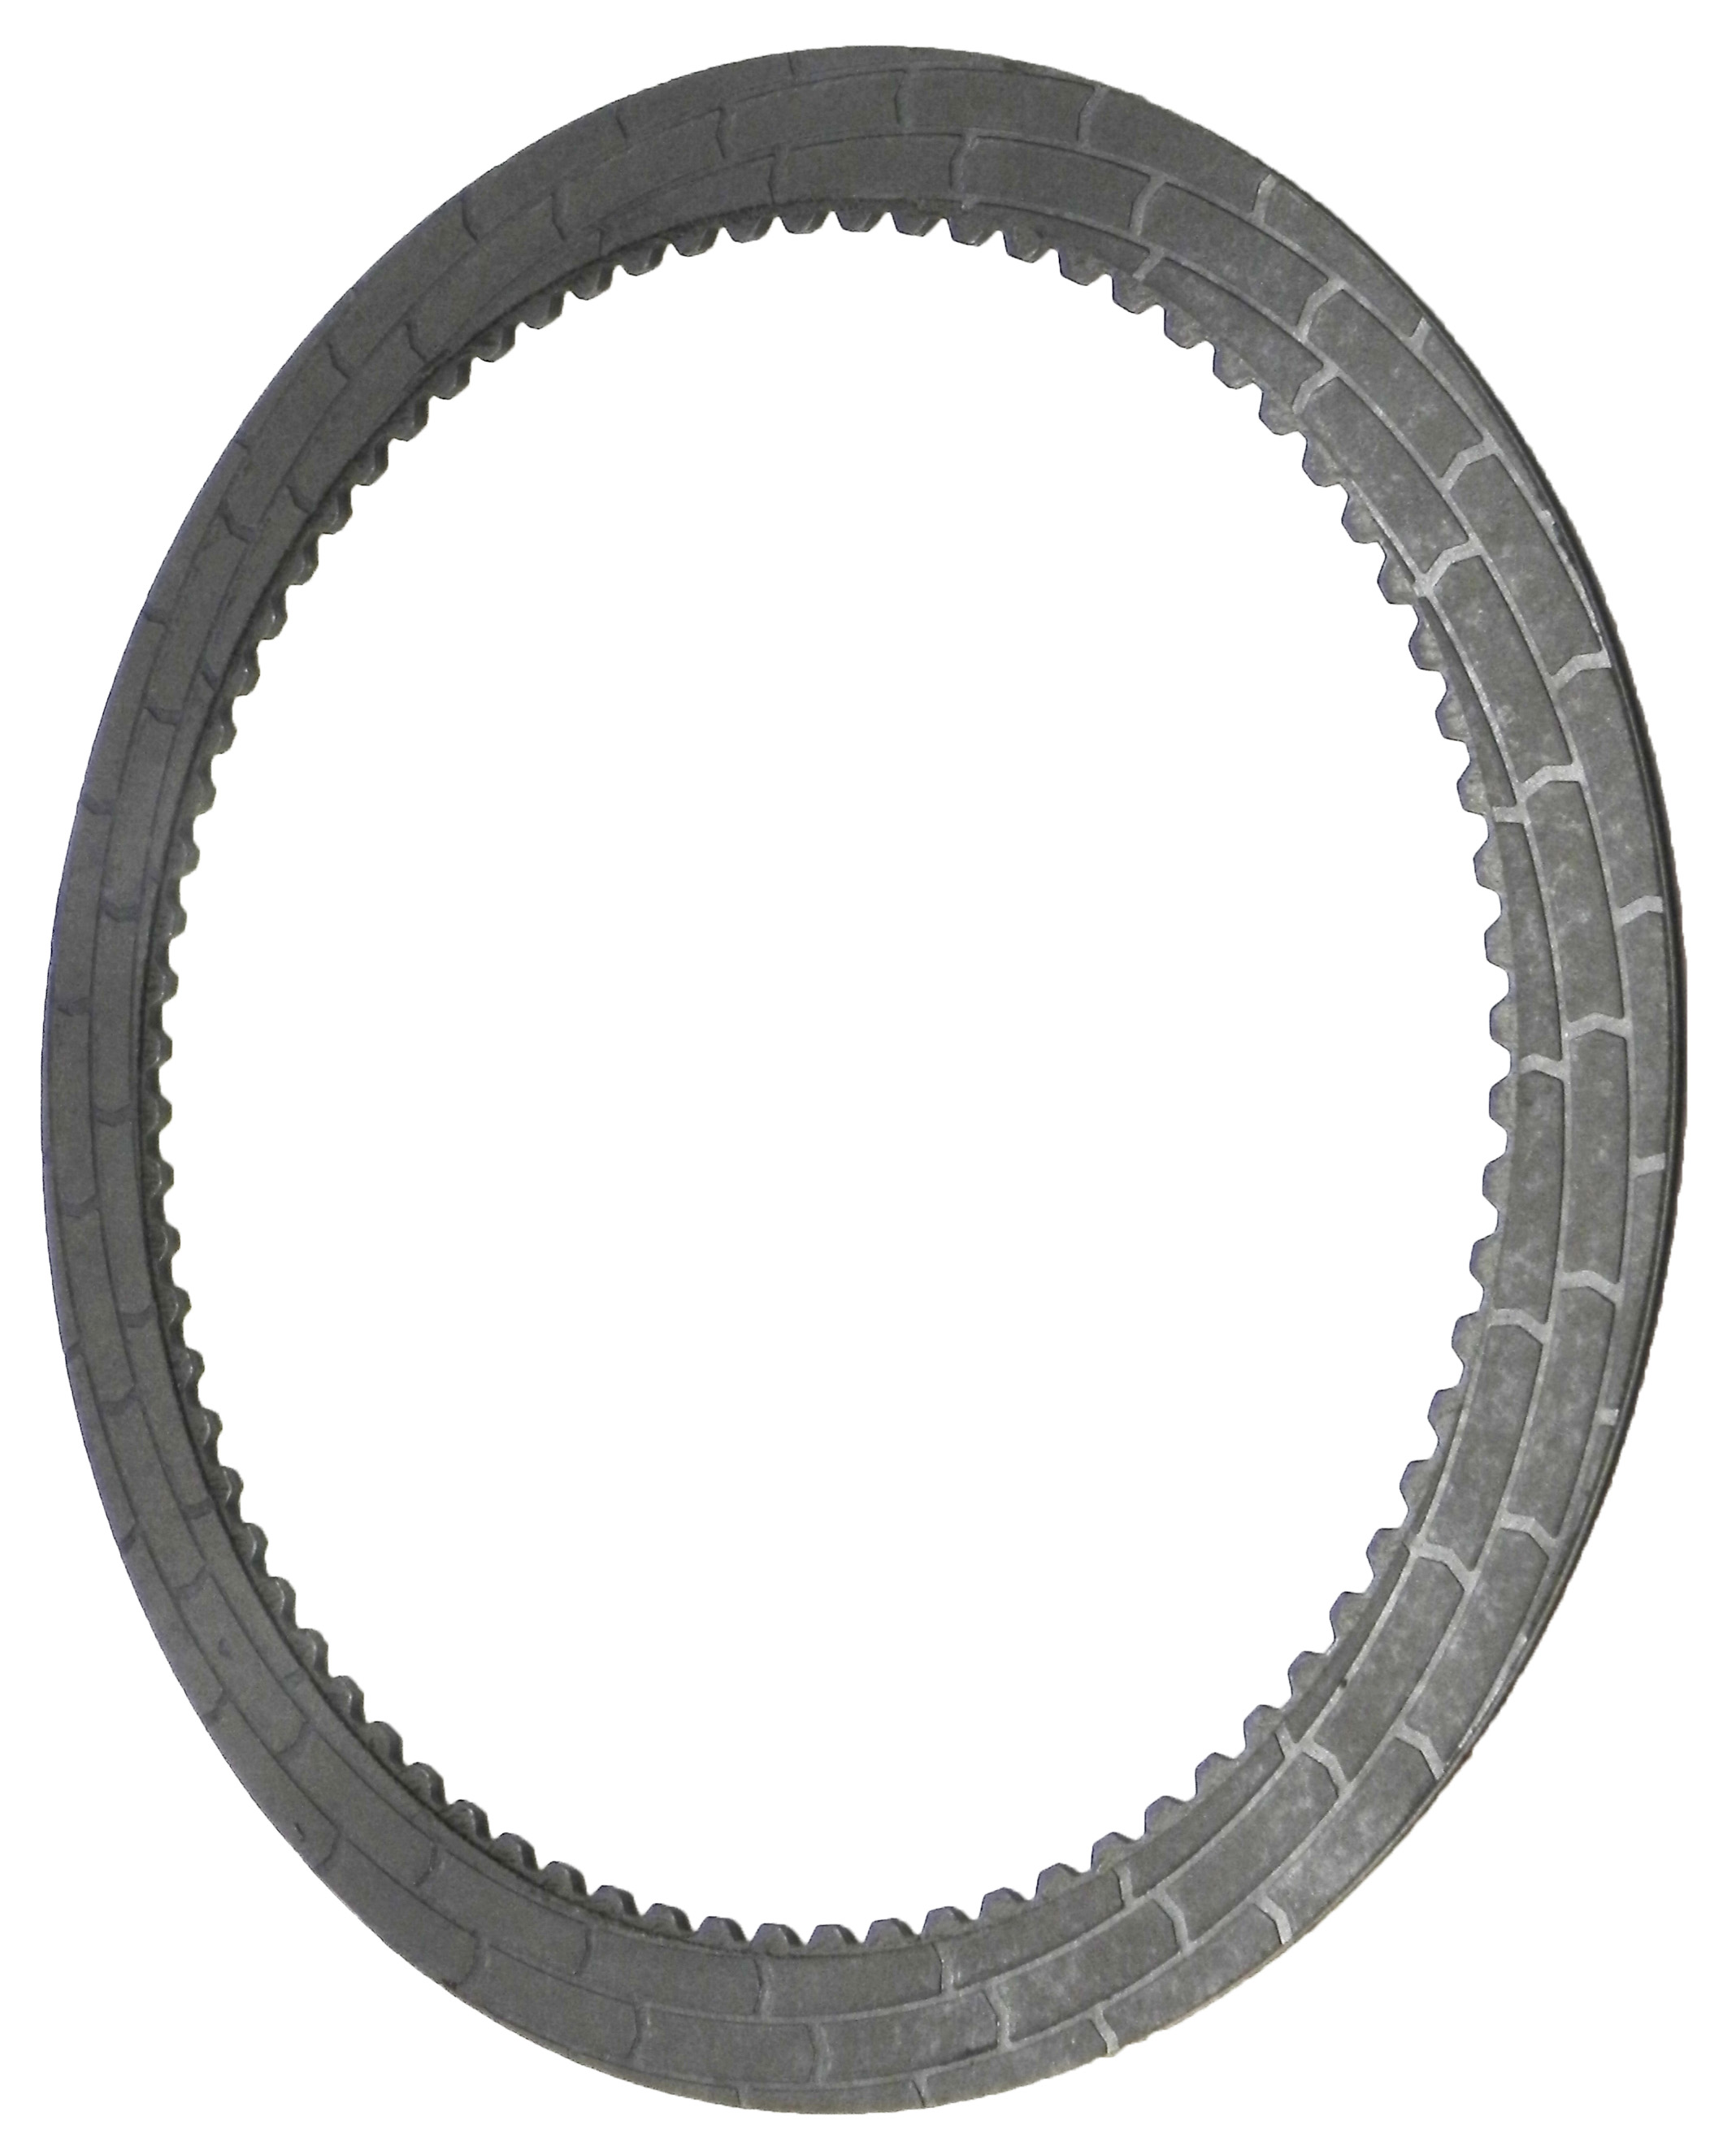 5R110W TorqShift (HT) Hybrid Technology Friction Clutch Plate